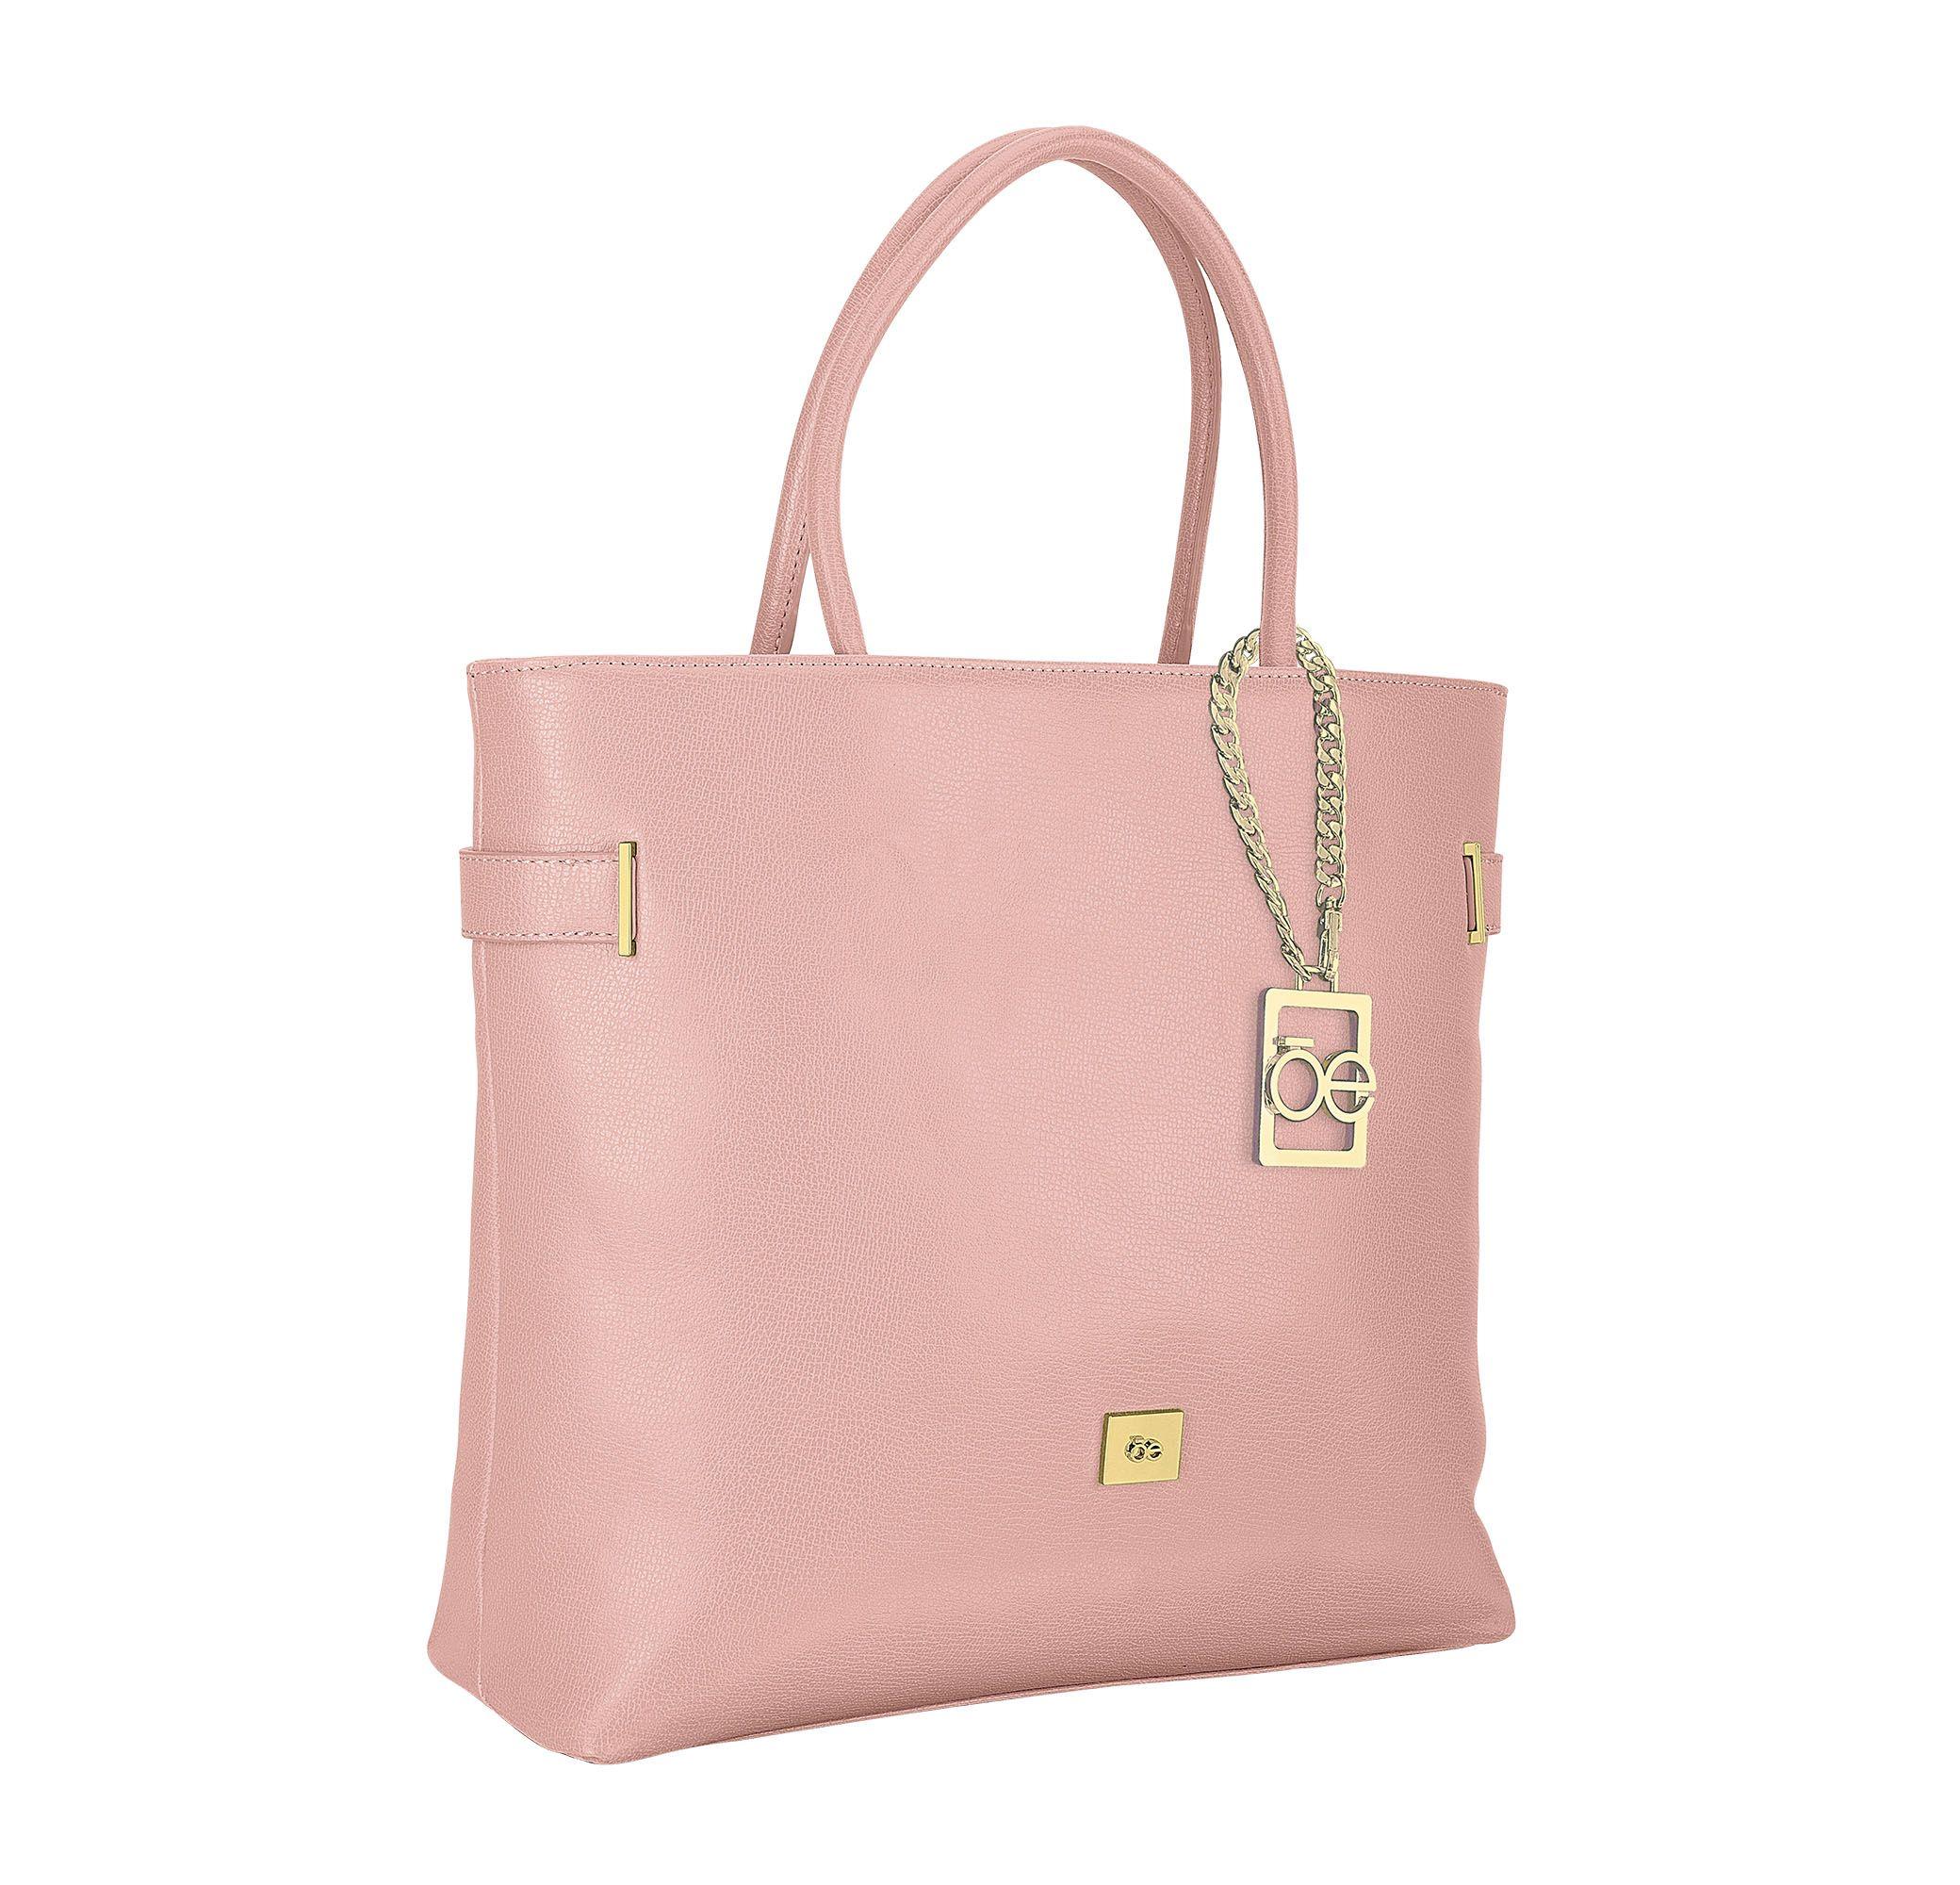 Cloe Oe Moda Bolsos Bolso Lyng 379 Satchel Handbags Purses